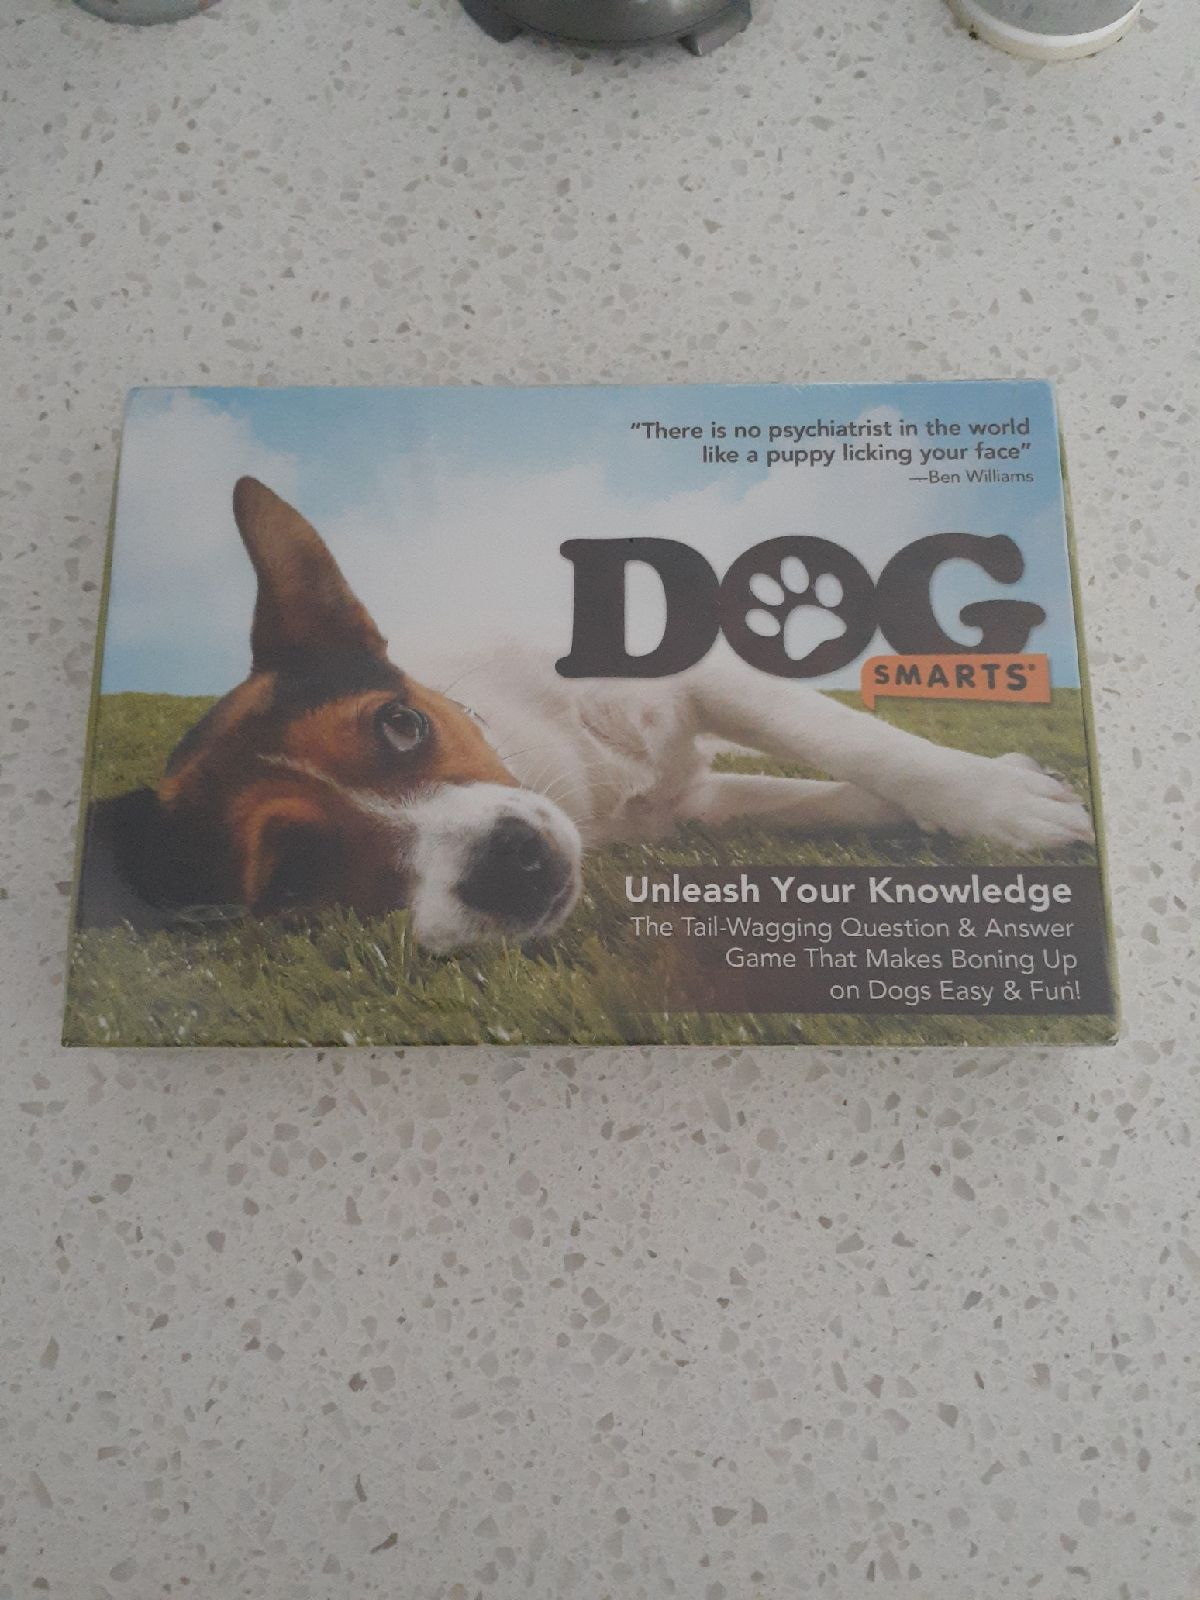 Dog smarts game